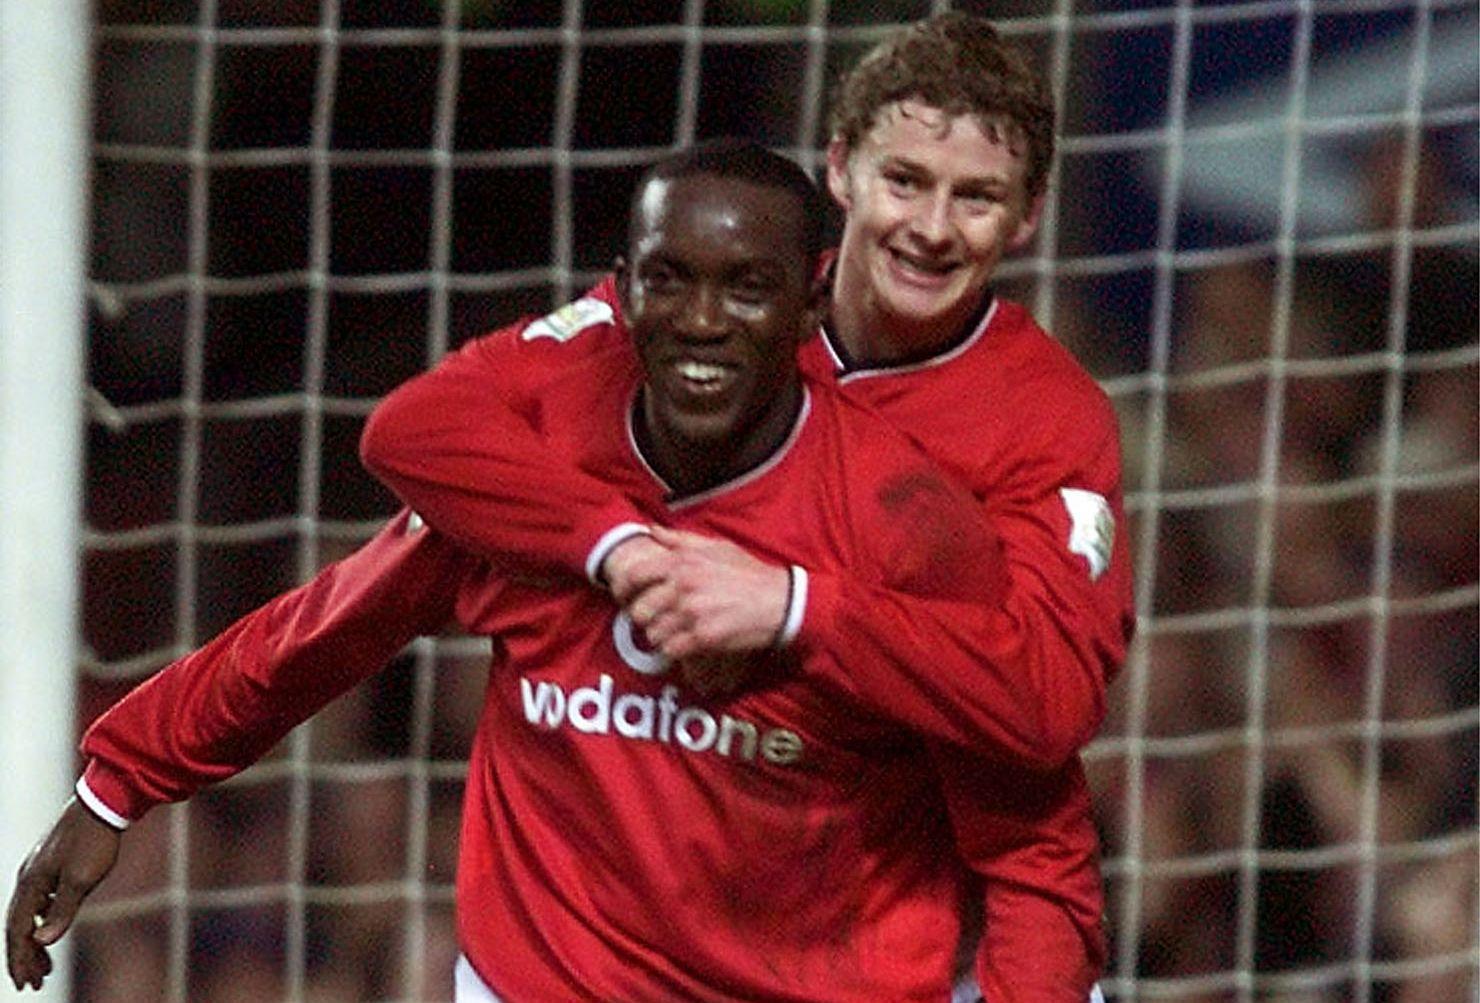 NOTORISK MÅLSCORER: Dwight Yorke, her sammen med Ole Gunnar Solskjær, scoret 48 ligamål på 92 kamper for Manchester United.